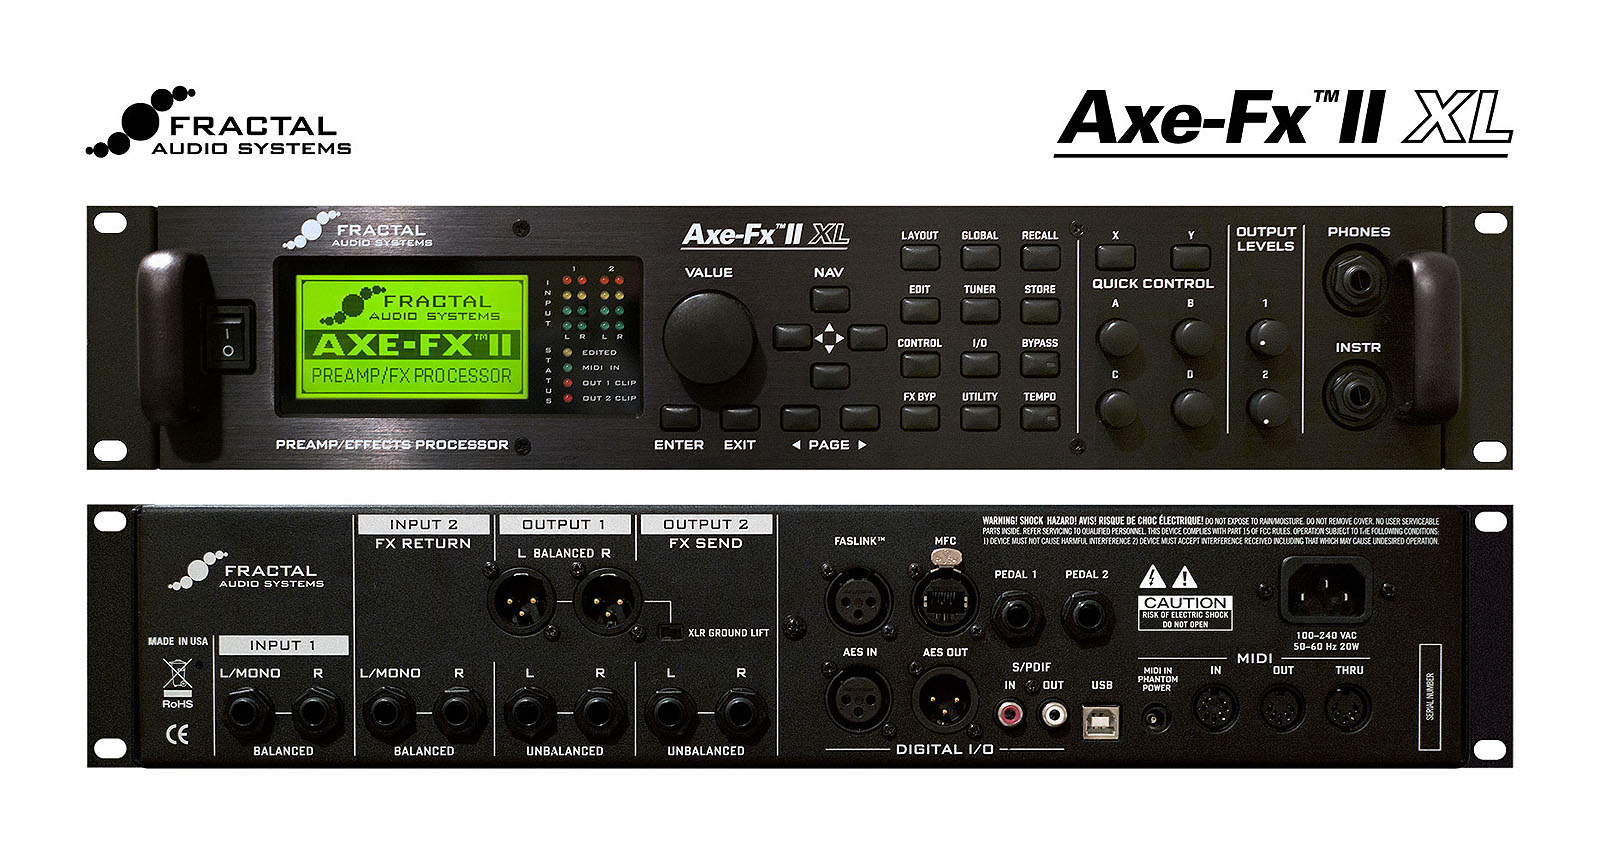 05-59n31-axe-fx2xl.jpg